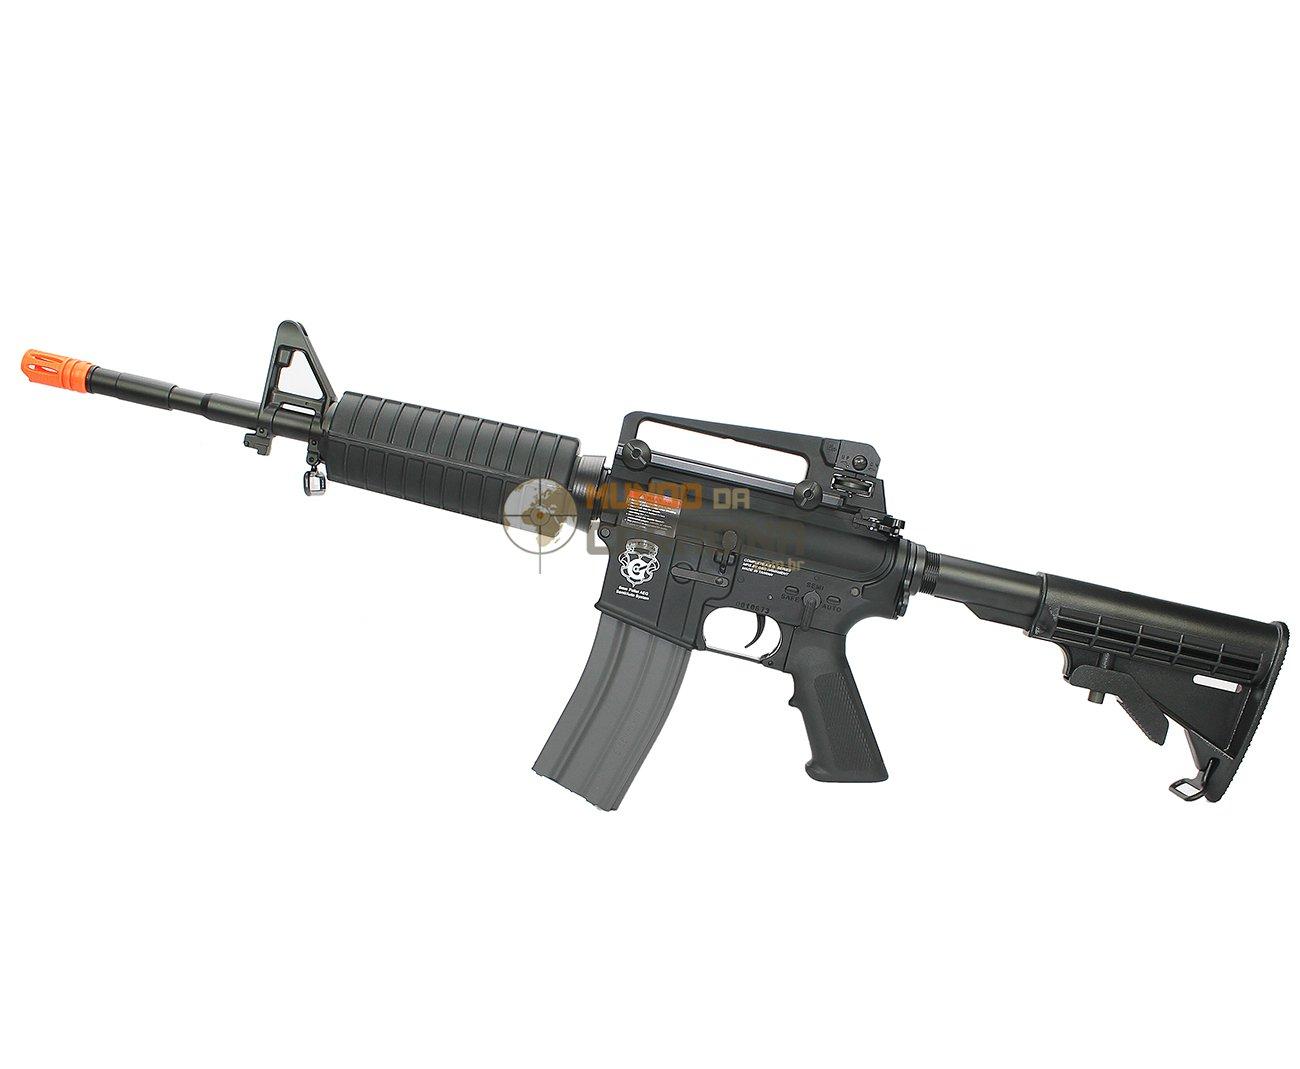 Rifle De Airsoft M4a1 Gr16 Blow Back Cal 6 Mm - G&g